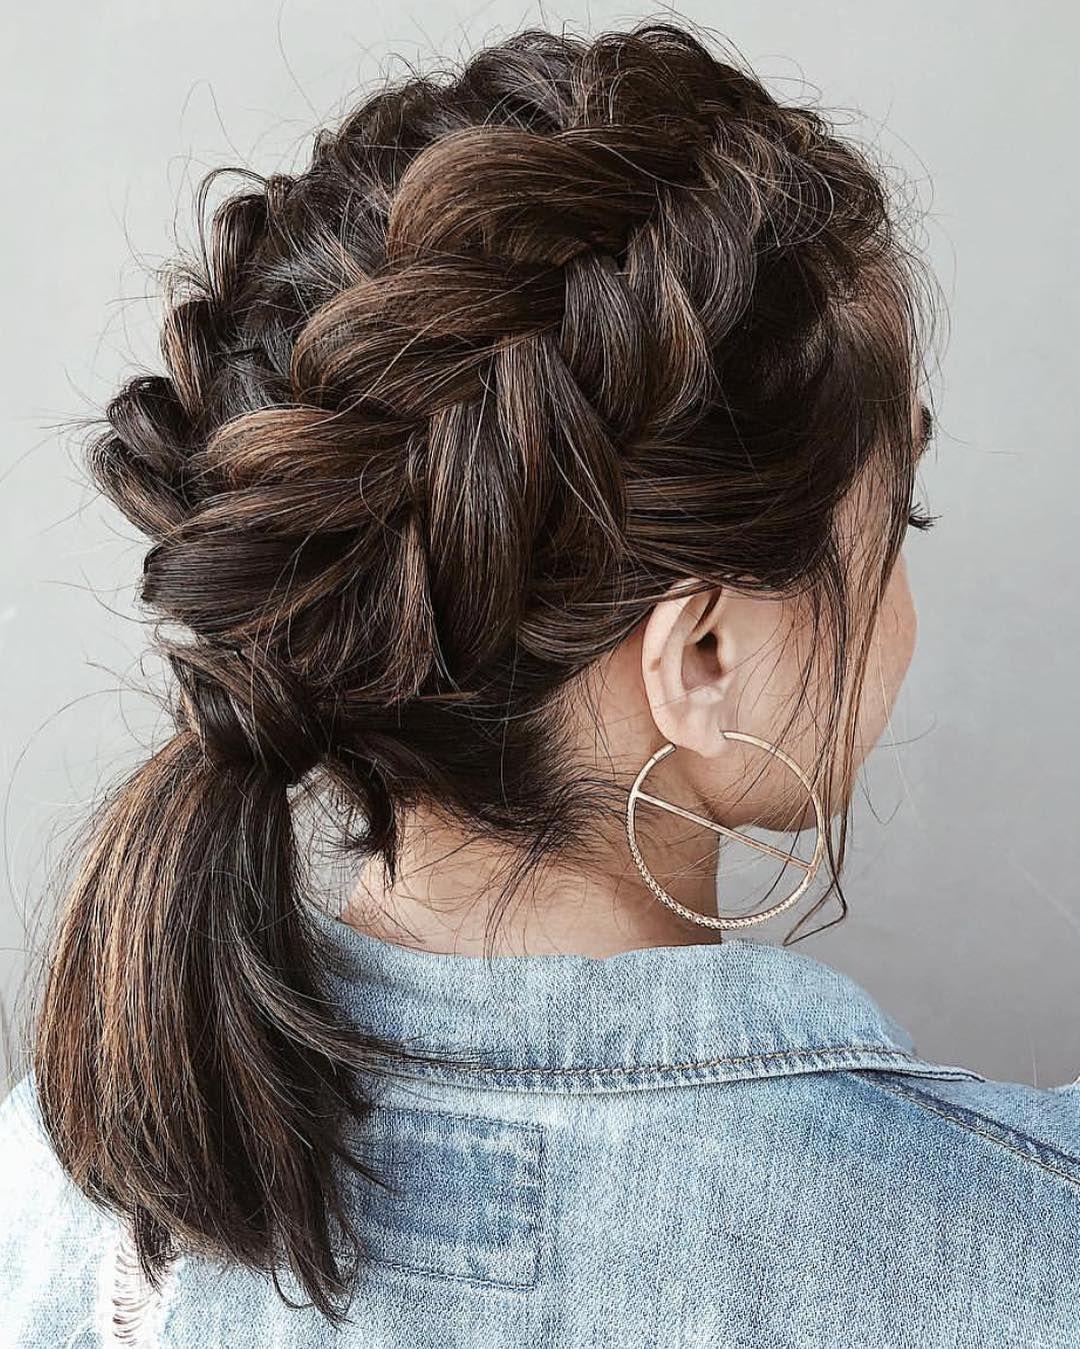 Shorthairstyles Shorthair Hairstyles Braidedhairstyles French Braid Short Hair Elegant Ponytail Braids For Short Hair